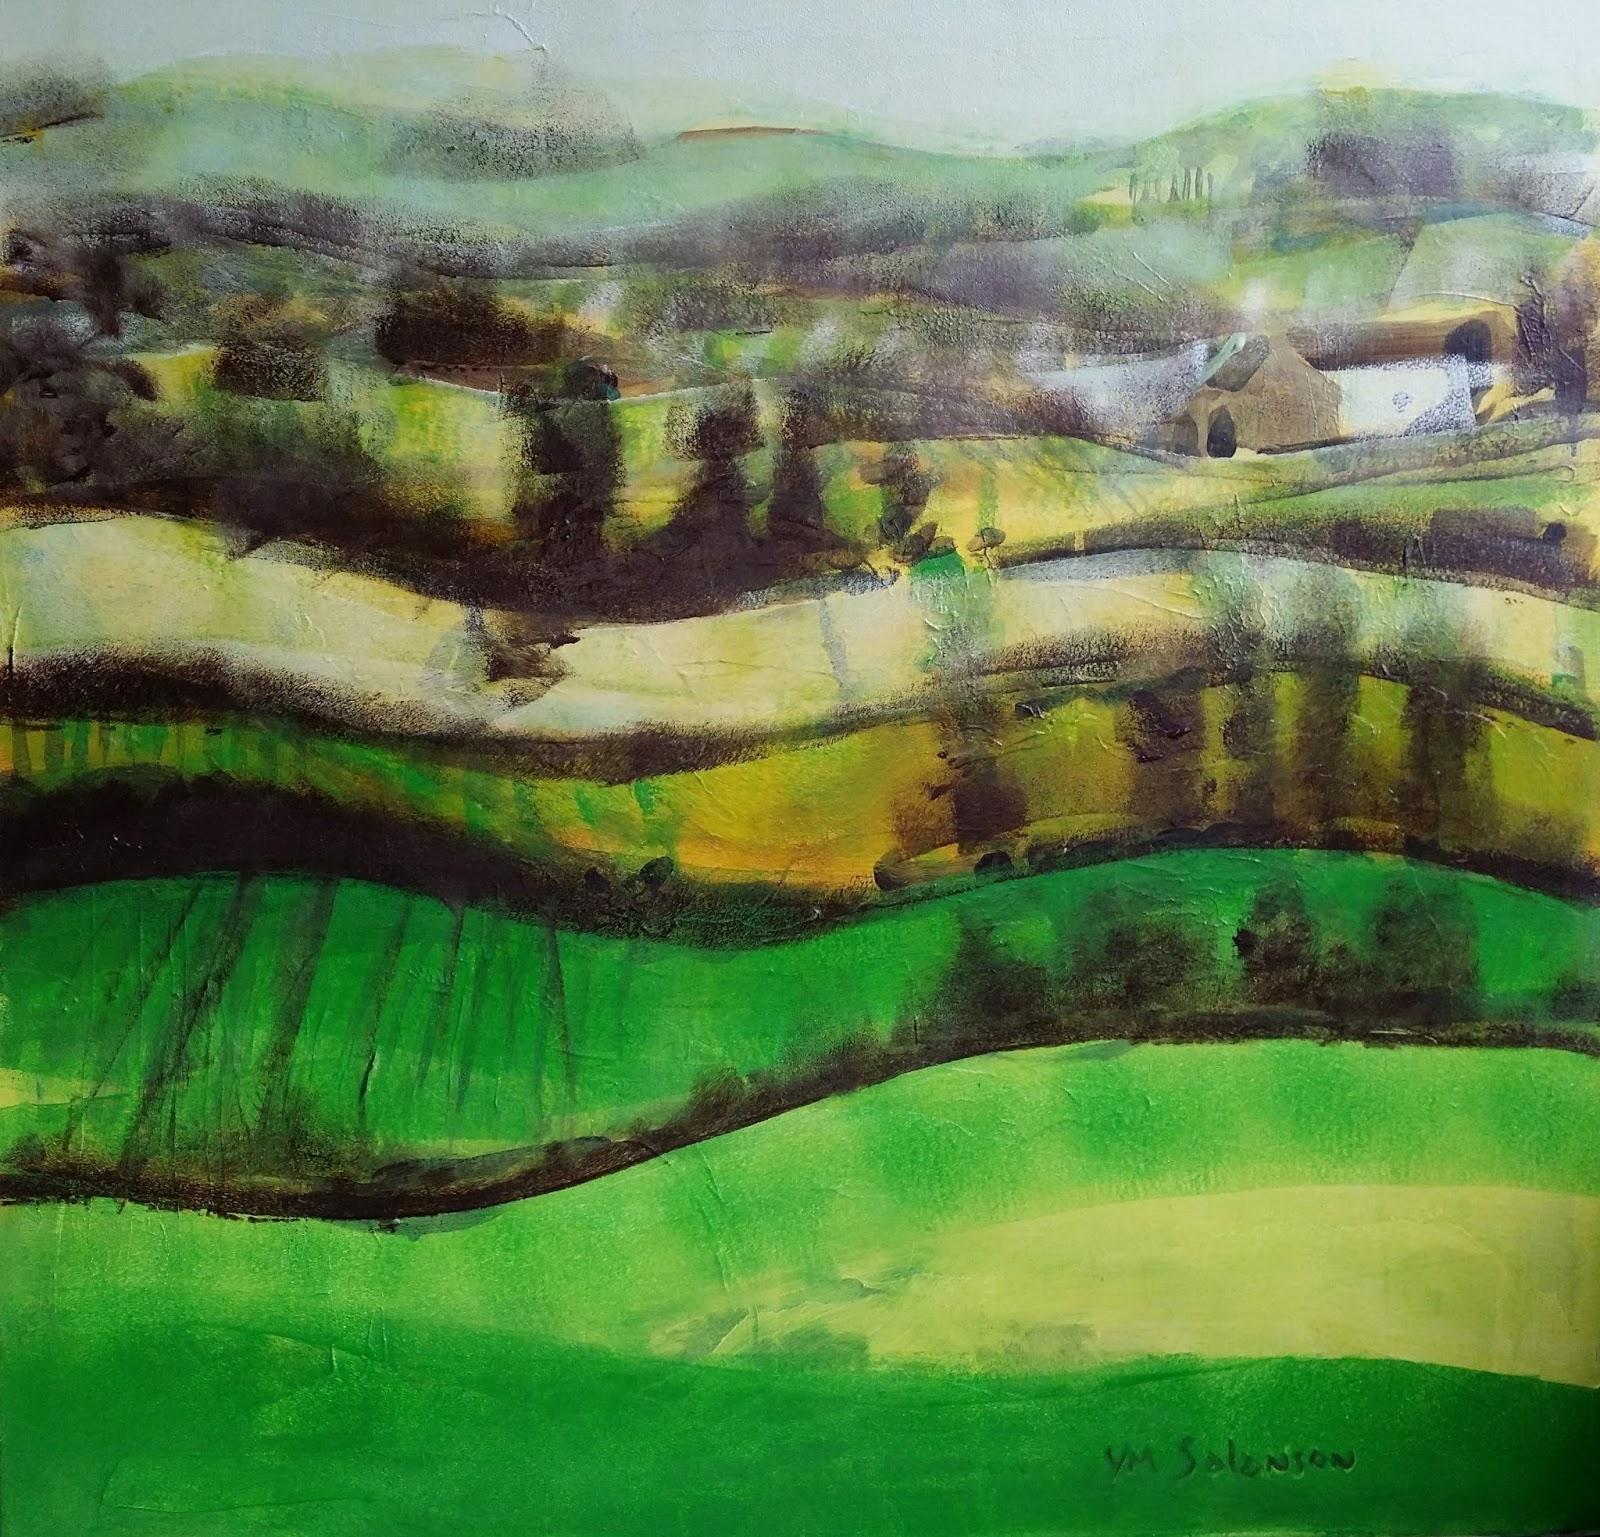 Yves-Marie Salanson, Landscape